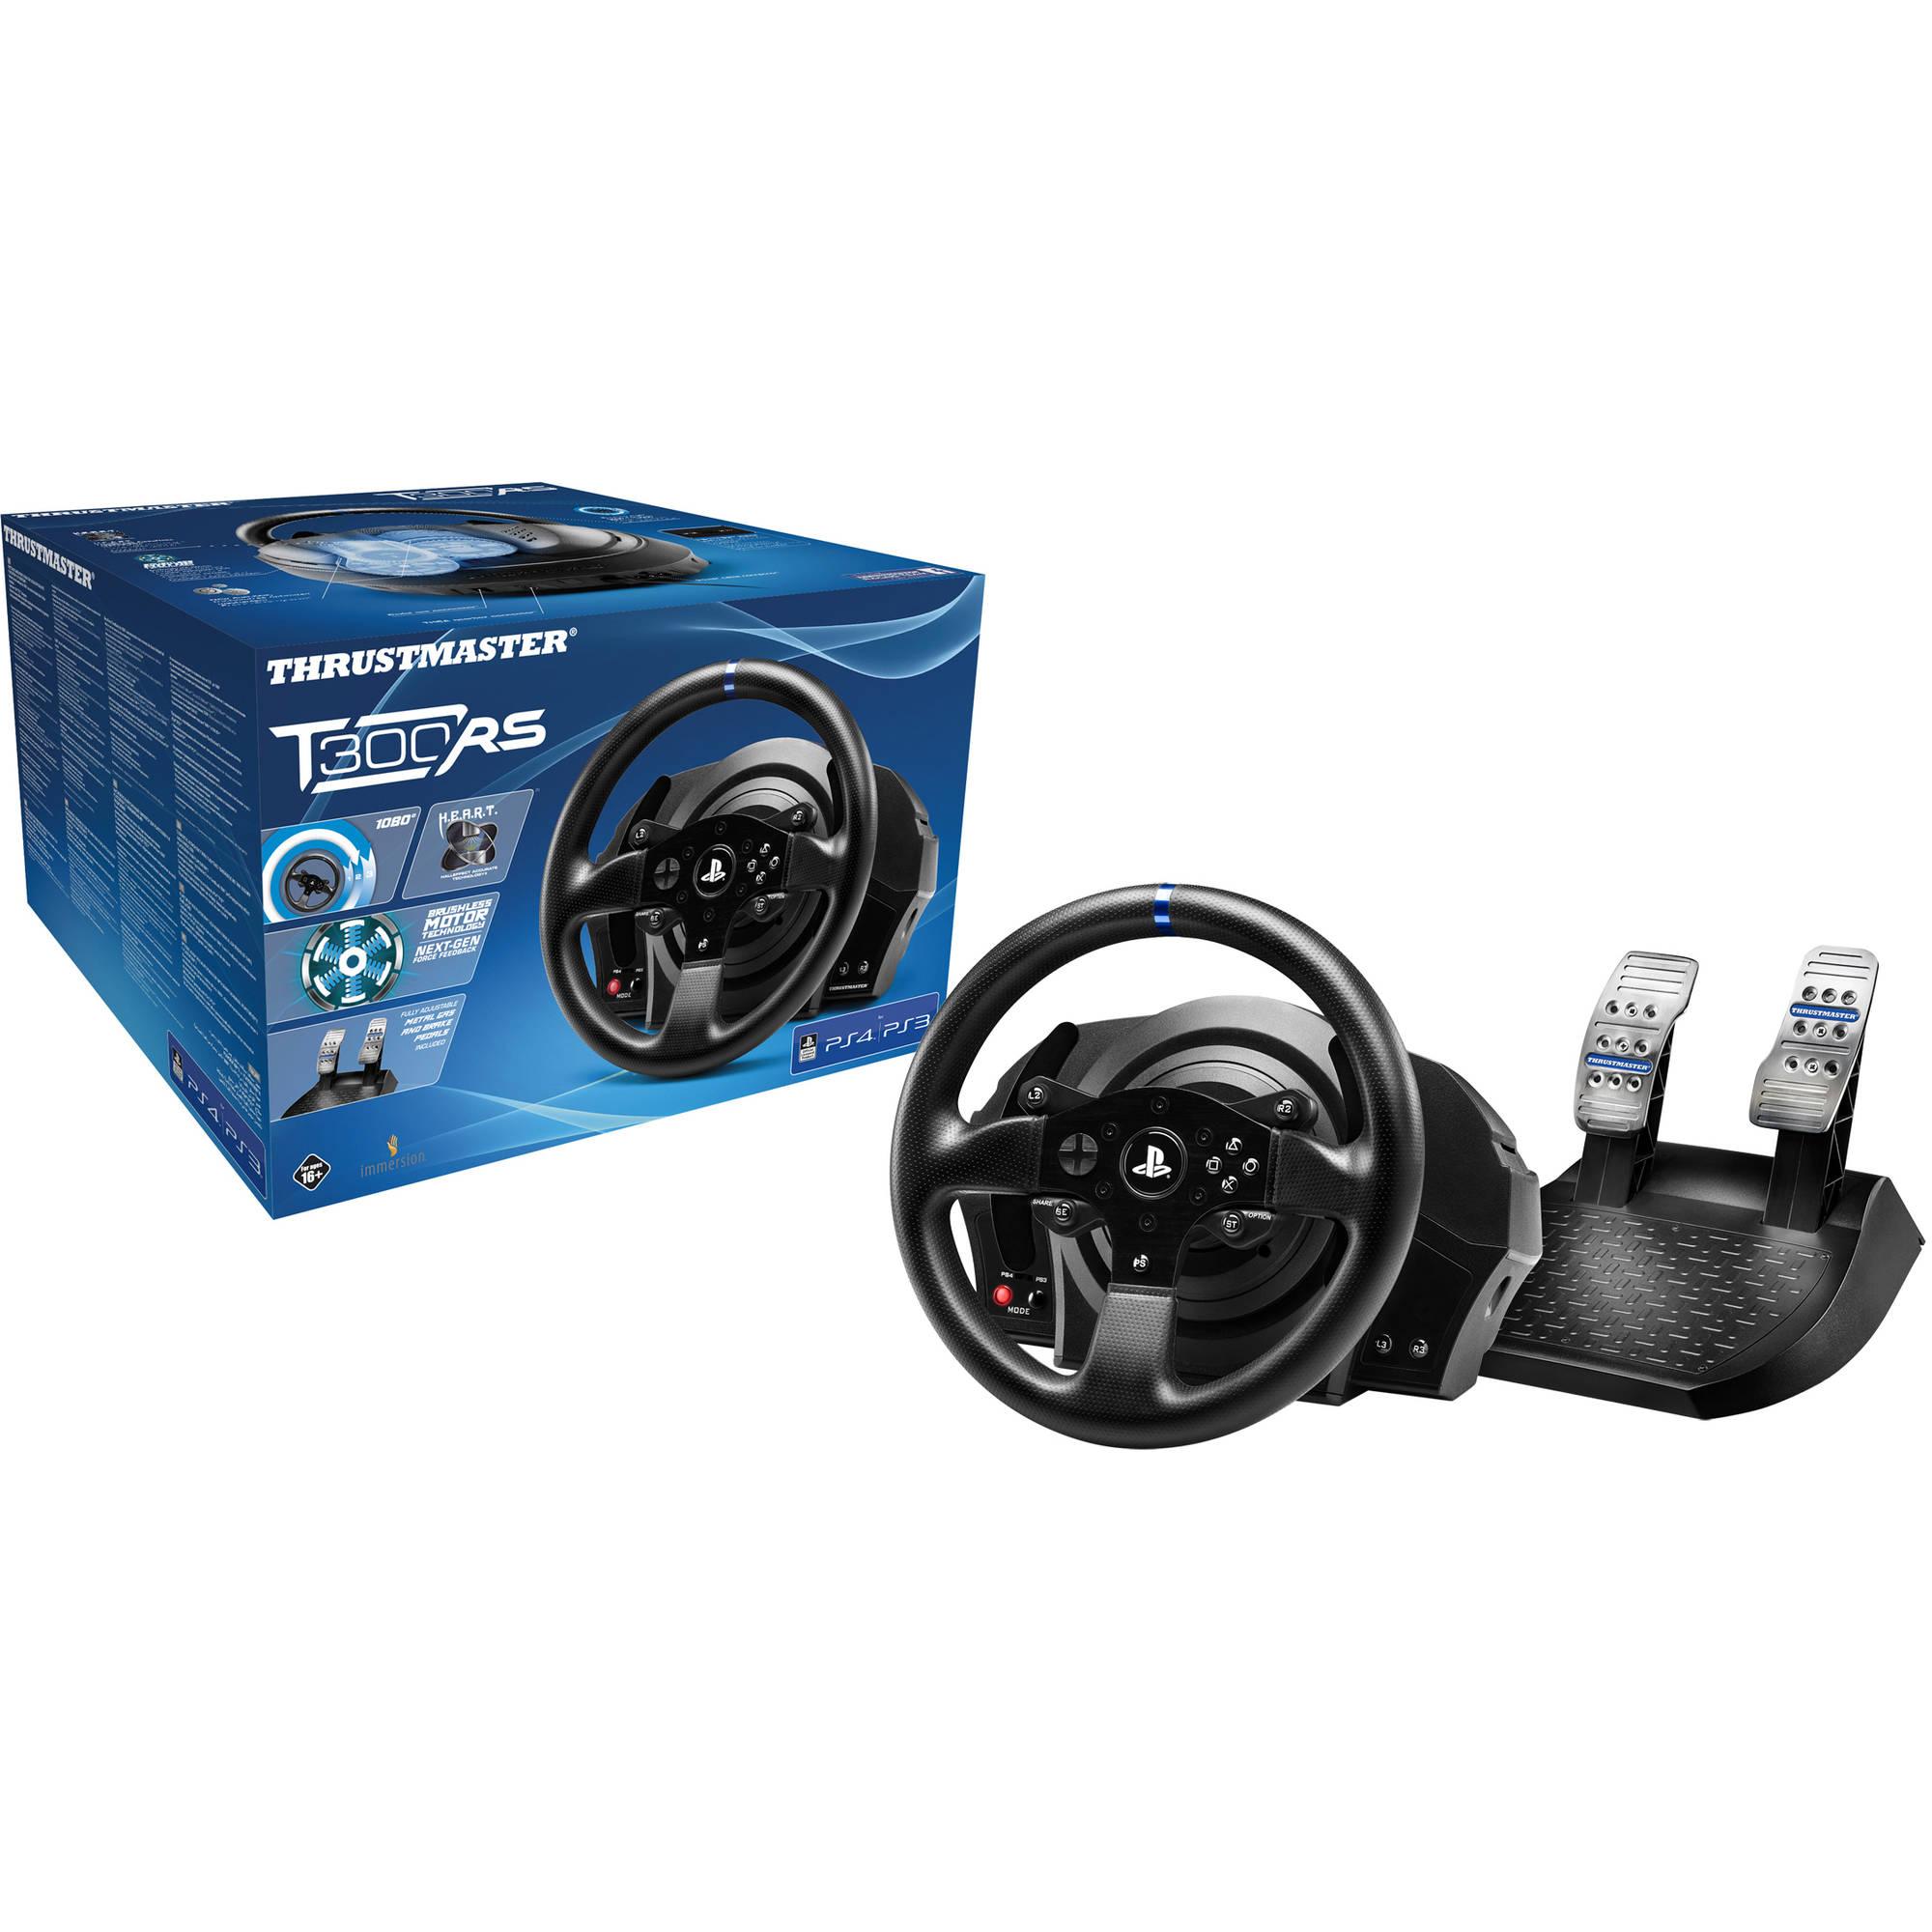 Thrustmaster T300 RS Racing Wheel $192.08